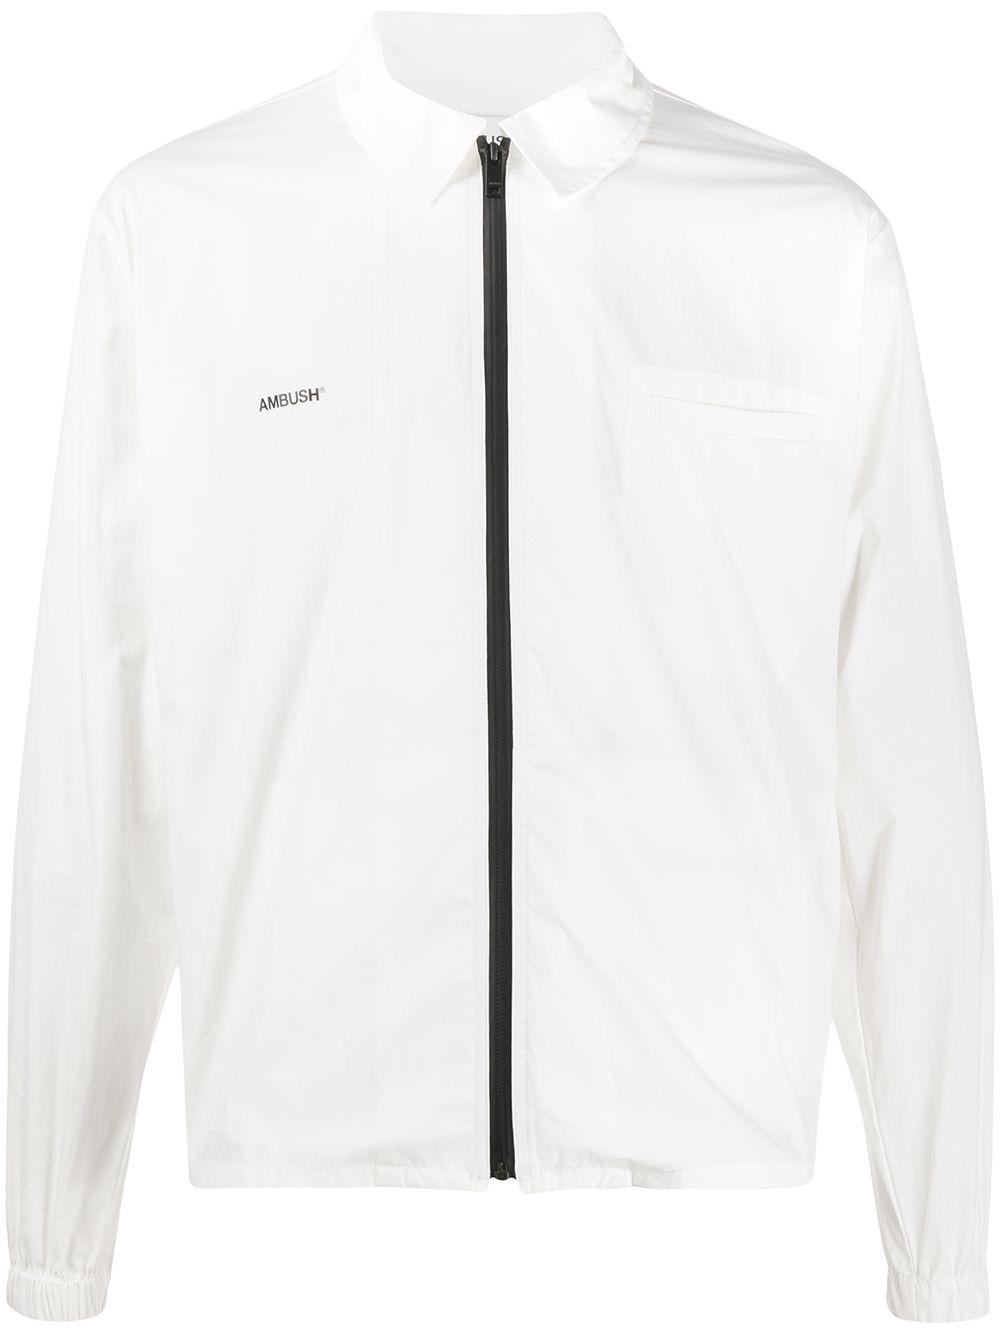 Picture of Ambush | Zip-Up Shirt Jacket